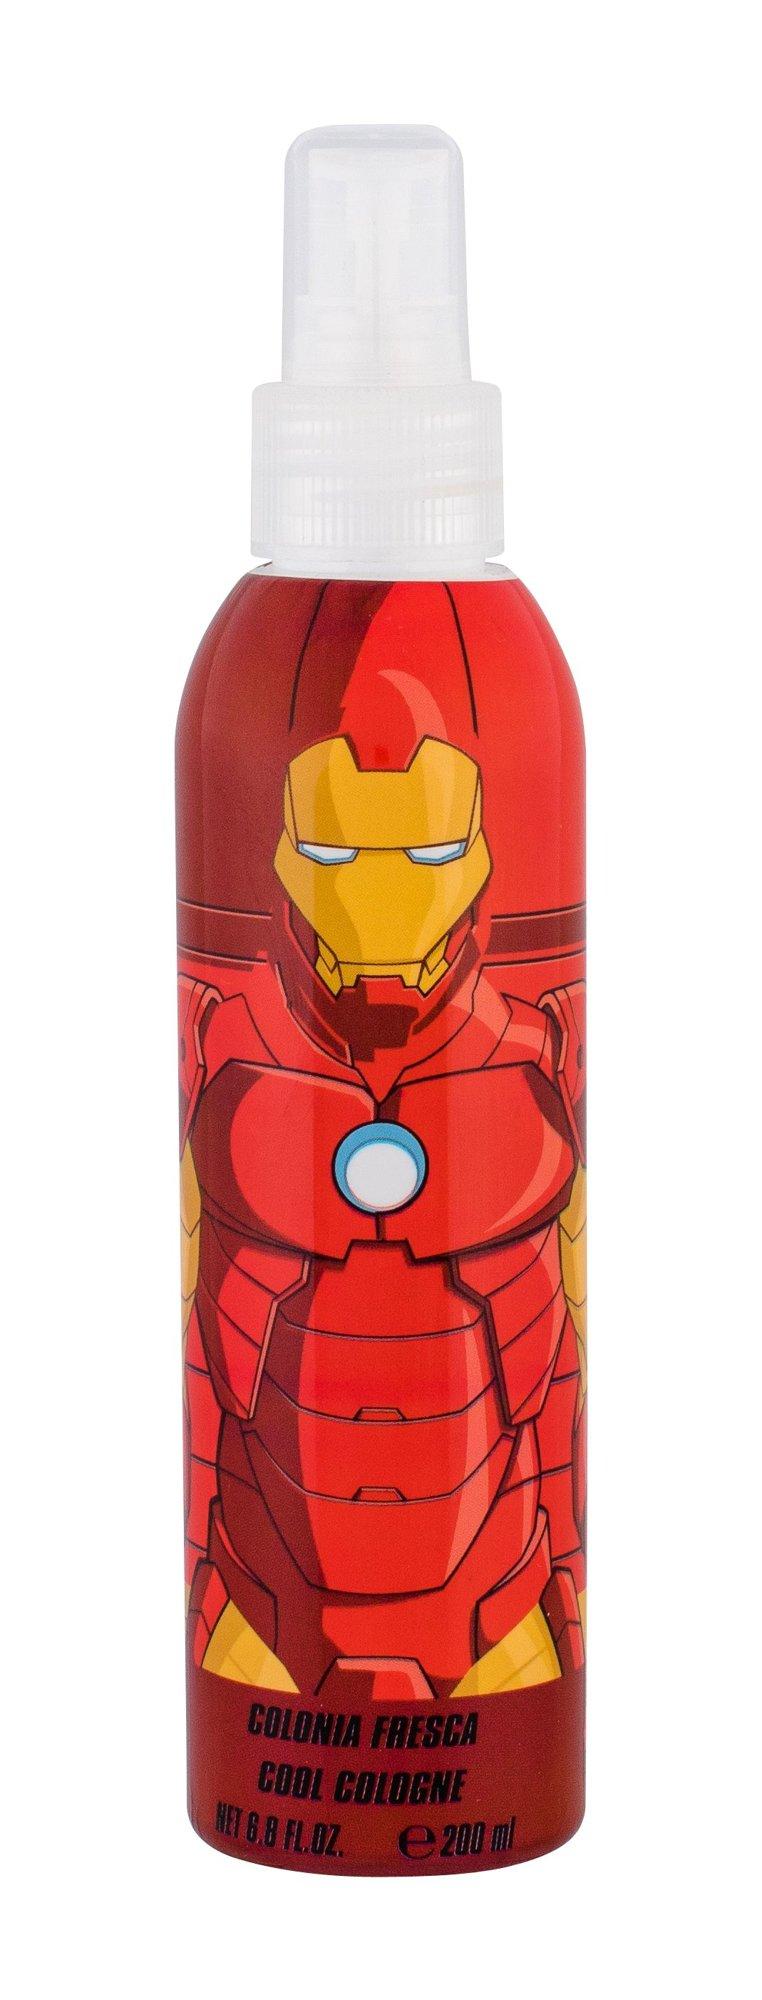 Marvel Iron Man Body Spray 200ml